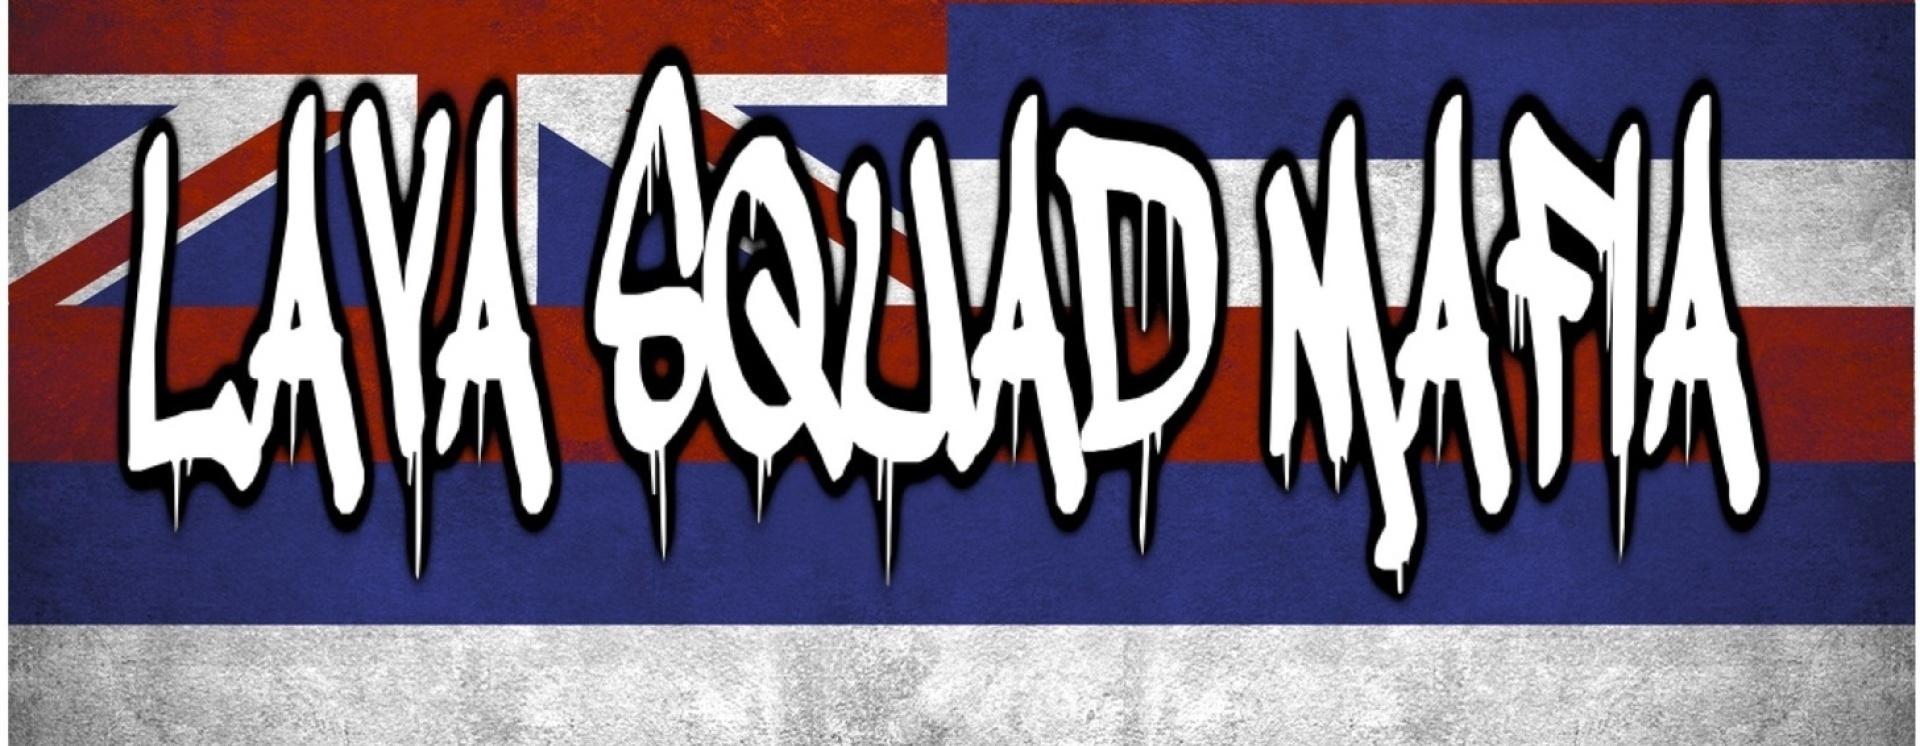 1353758647 lava squad mafia logo copy